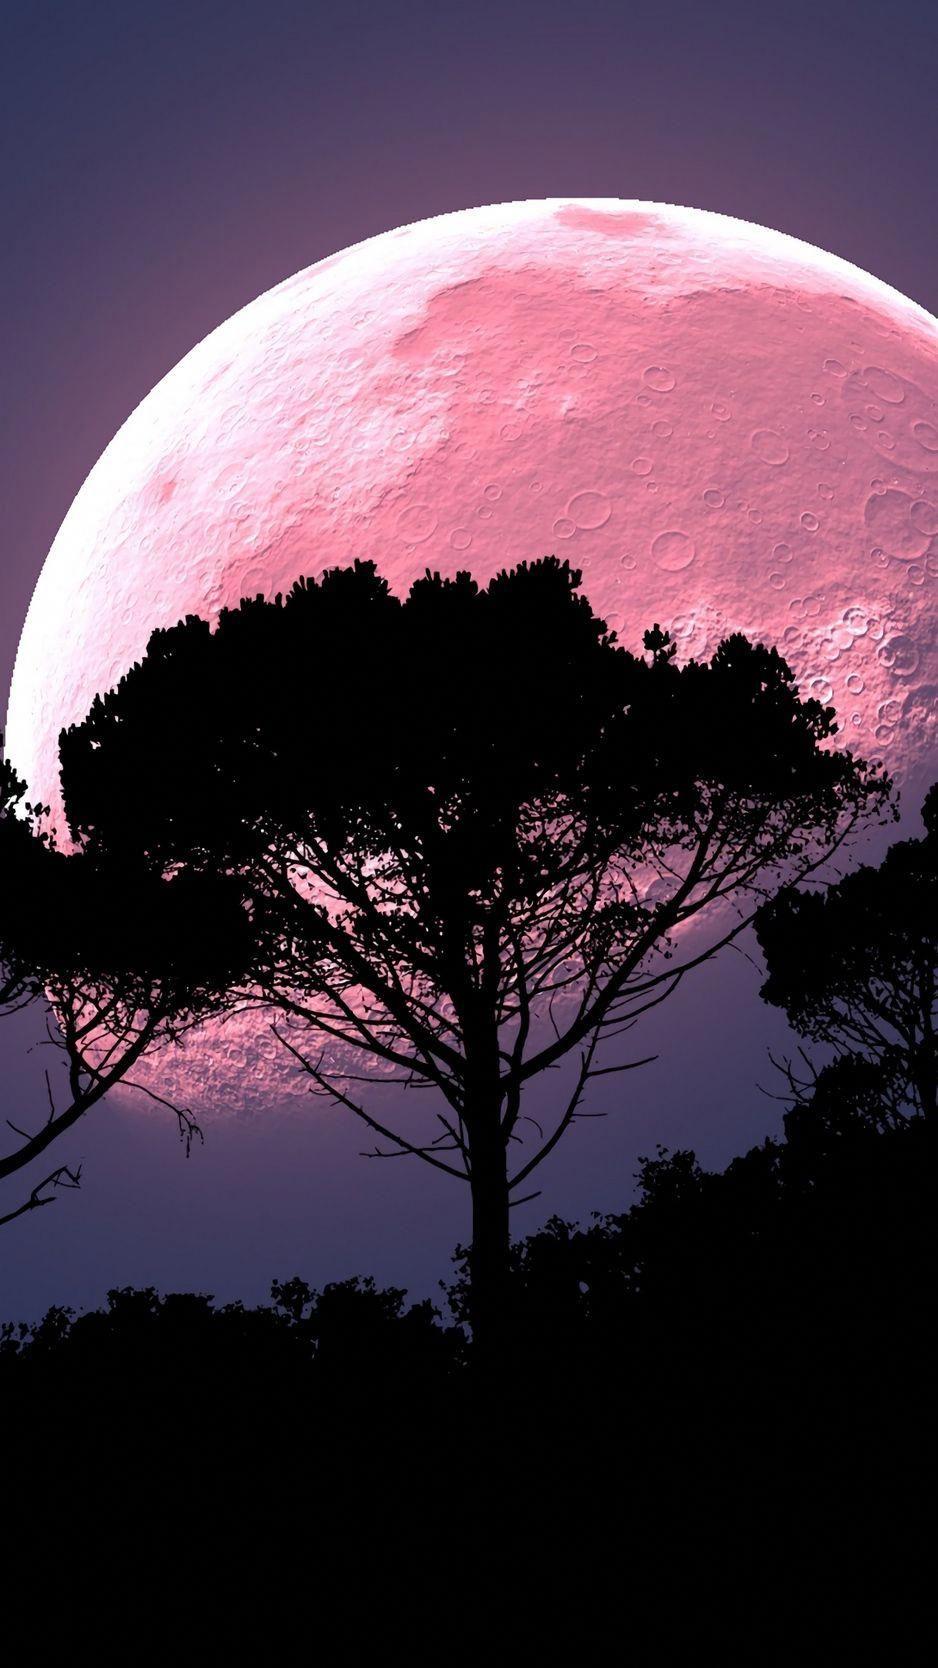 Pin By Leandra De Almeida On Ipad Pro Planets Wallpaper Pink Moon Wallpaper Romantic Wallpaper